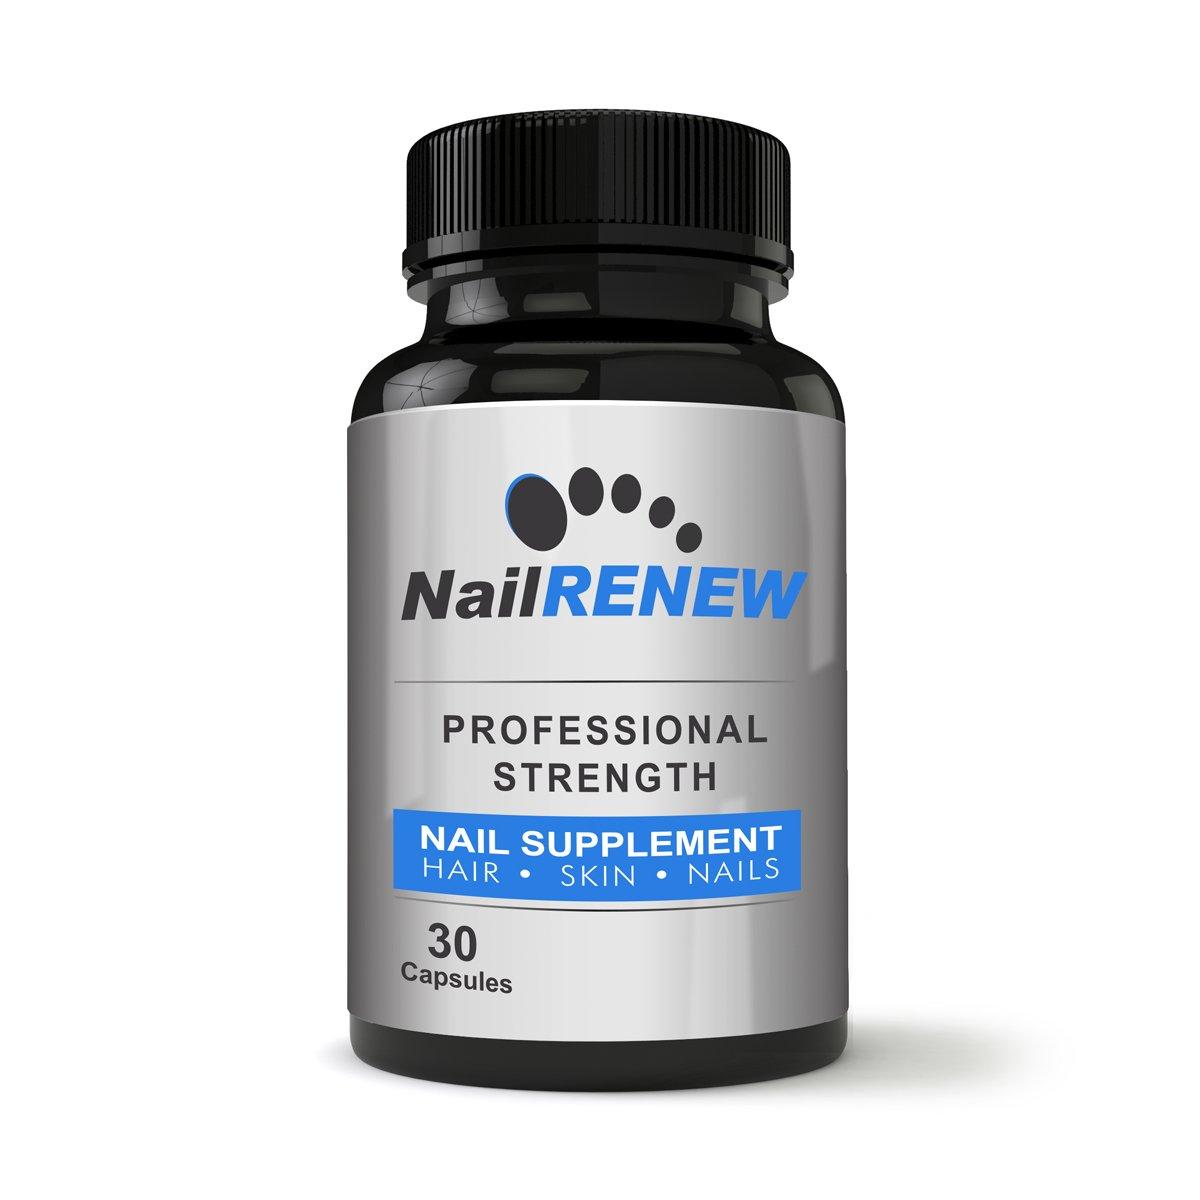 NailRENEW Daily Nail Supplement - Professional Strength Biotin/Vitamin Blend, 30 Capsules